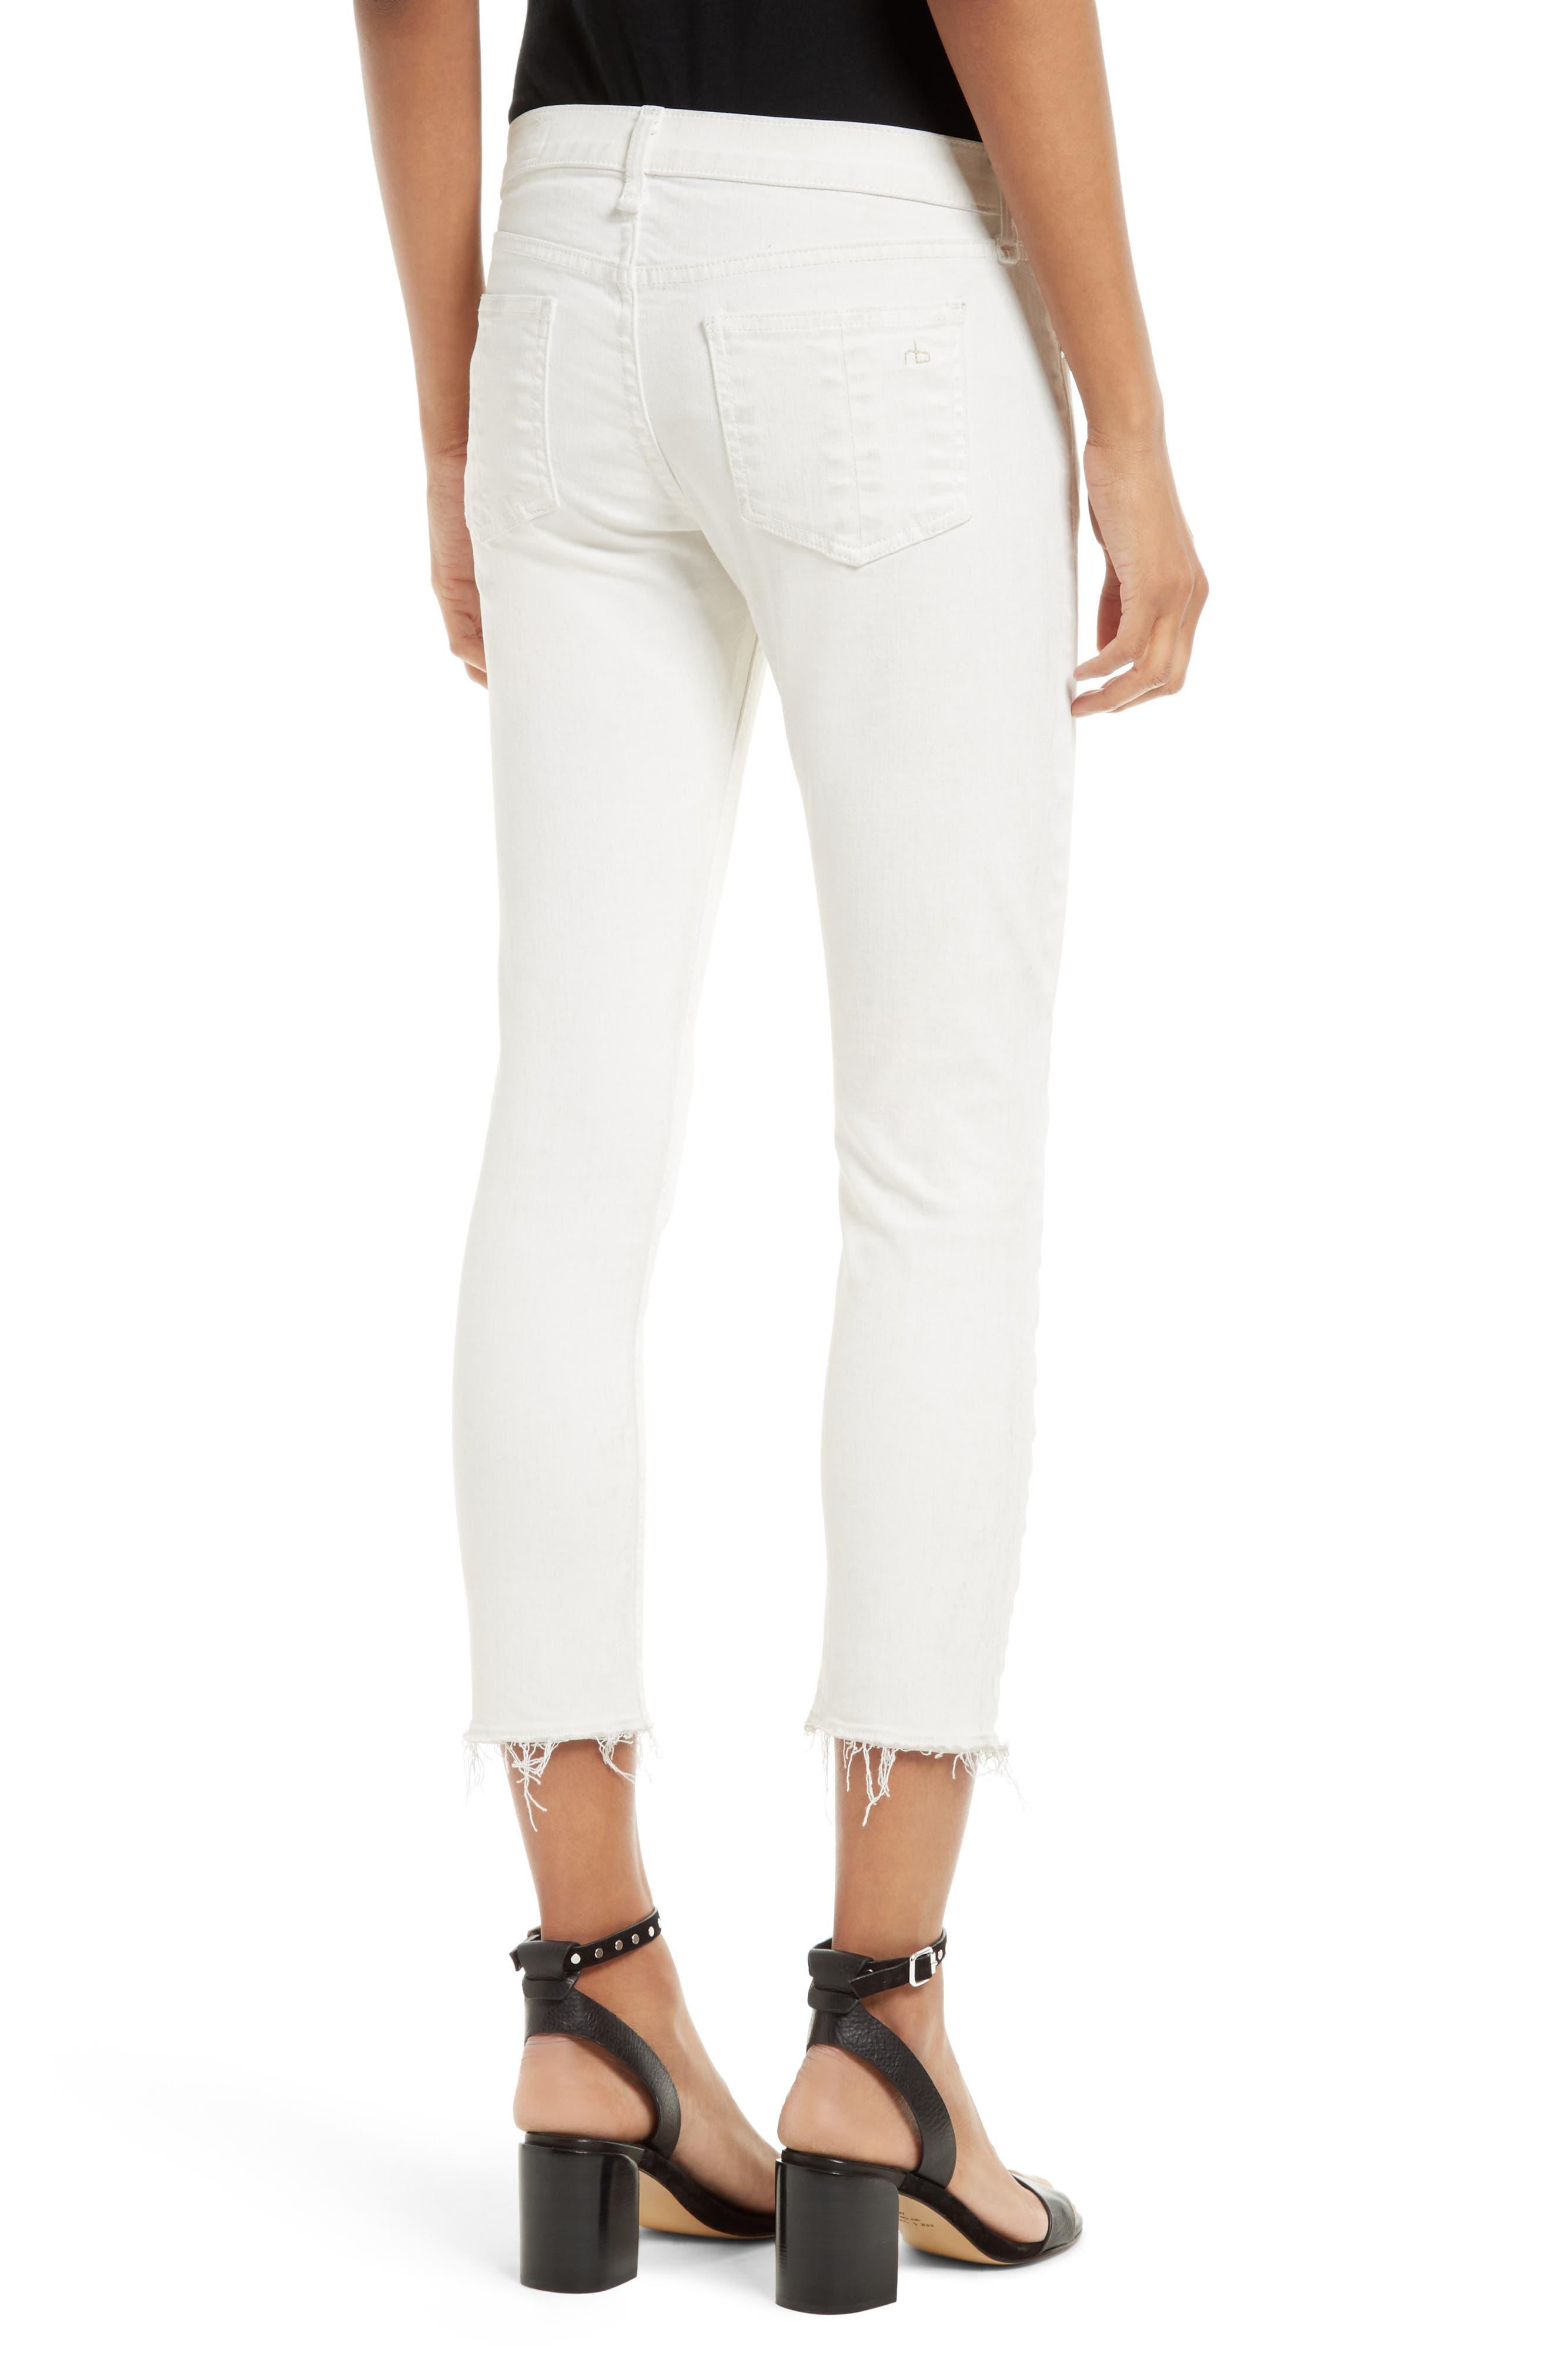 Capri Skinny Jeans,                             Alternate thumbnail 2, color,                             100